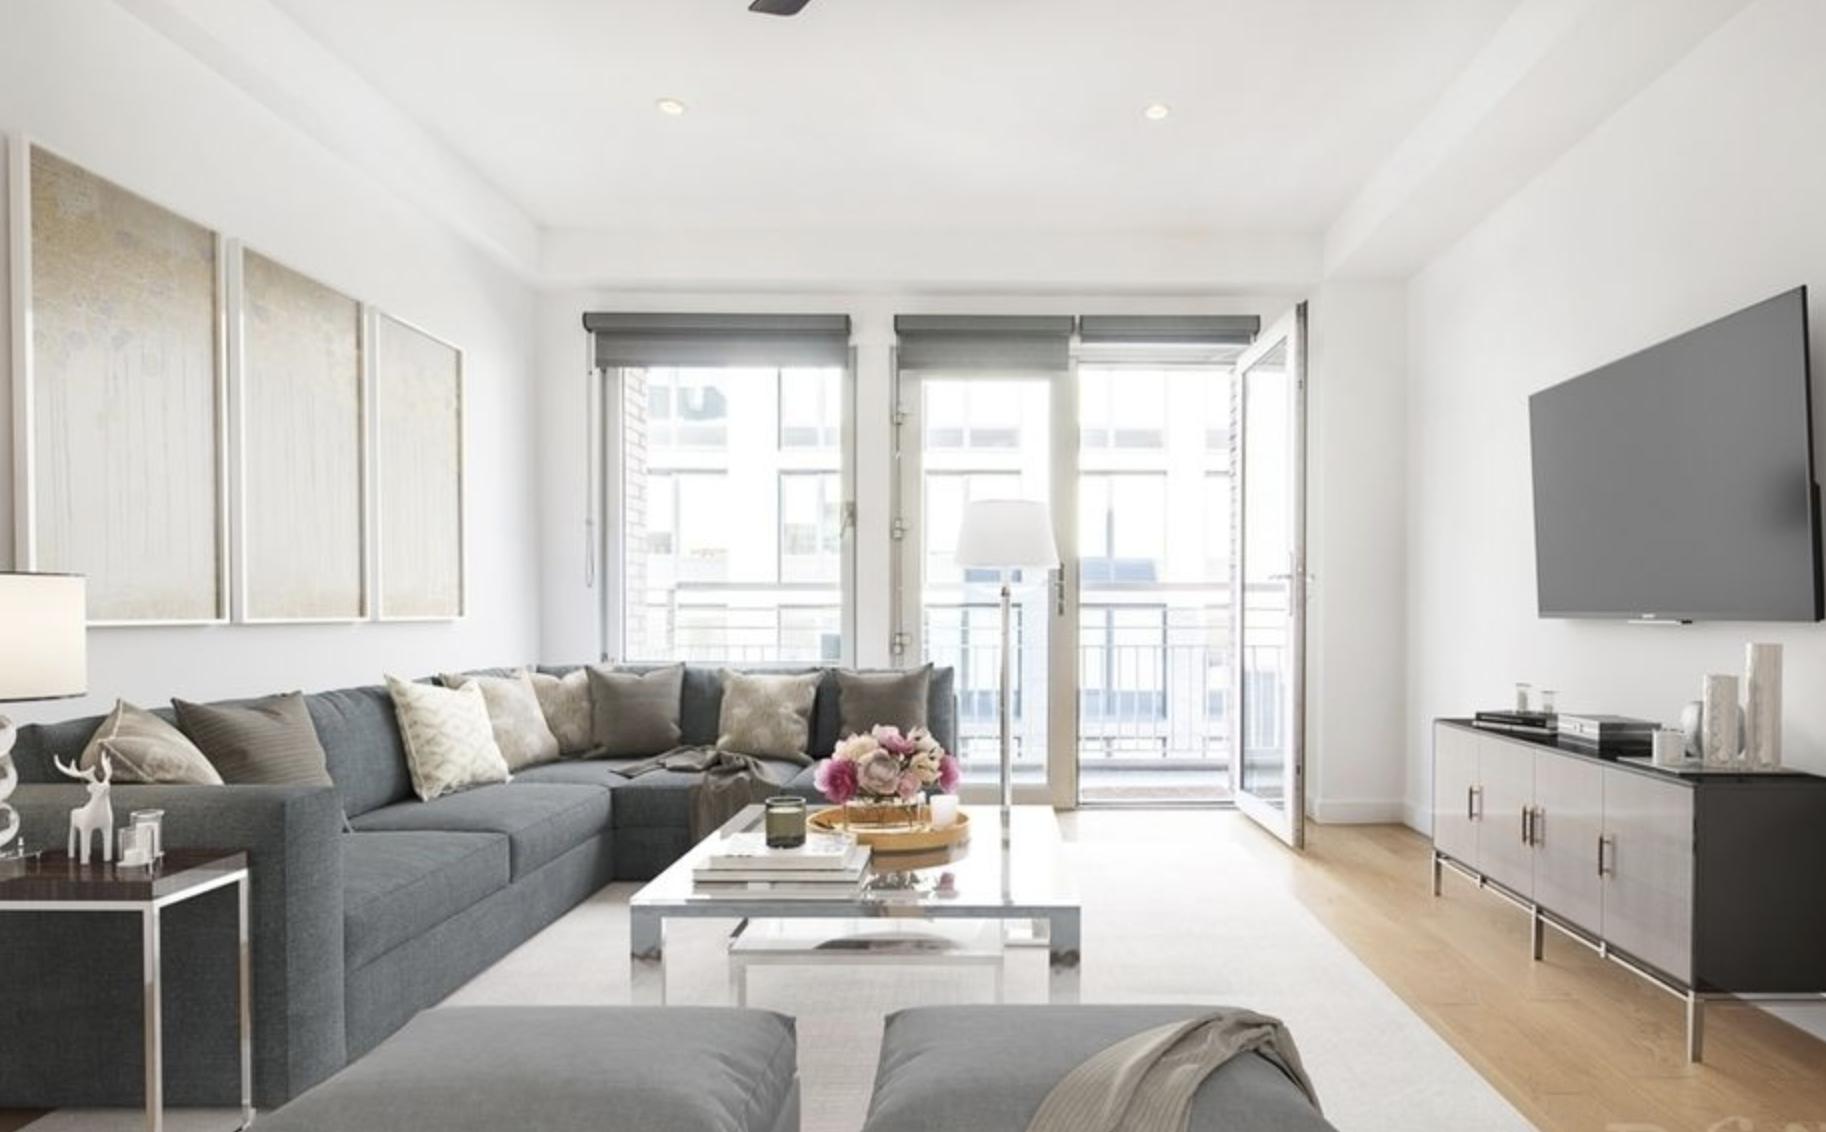 260 North 9th St, #5D - Williamsburg | Brooklyn    1 Bedroom // 1 Bath Days on Market — 50 Sold Price:    $982,000